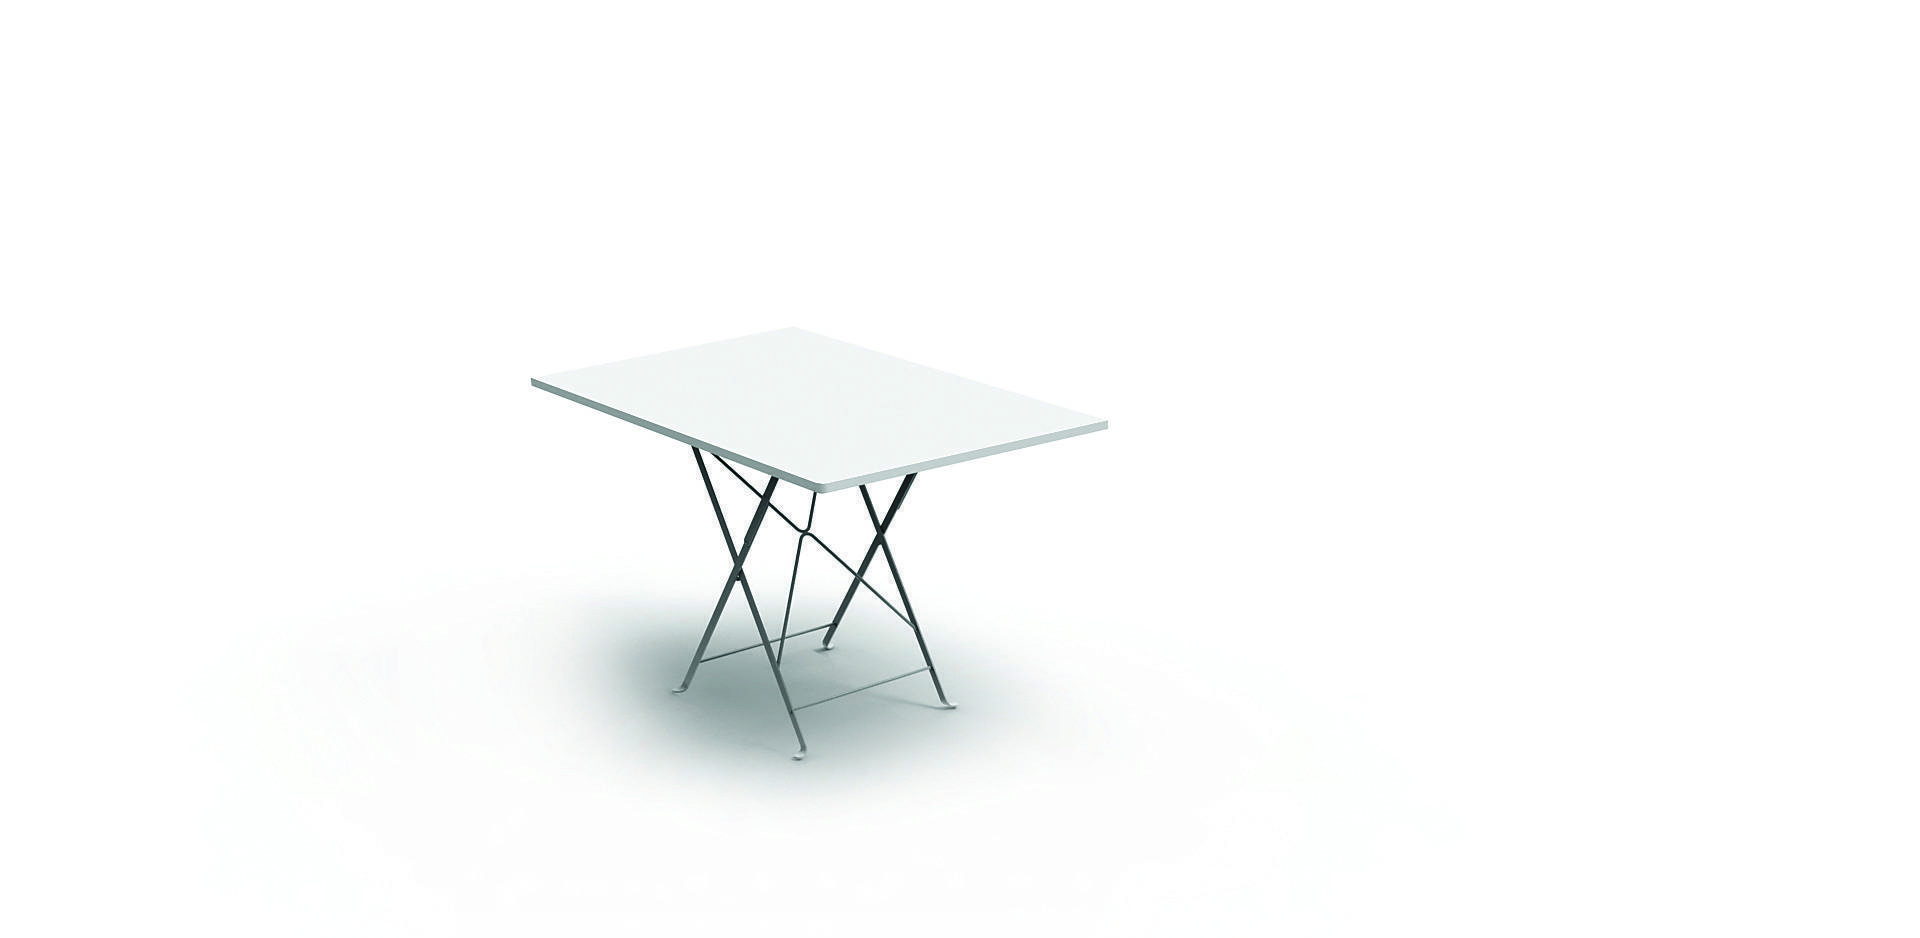 Tavolo Pieghevole E Allungabile.Vivereverde Tavolo Pieghevole Roy 110 Tavoli Da Giardino